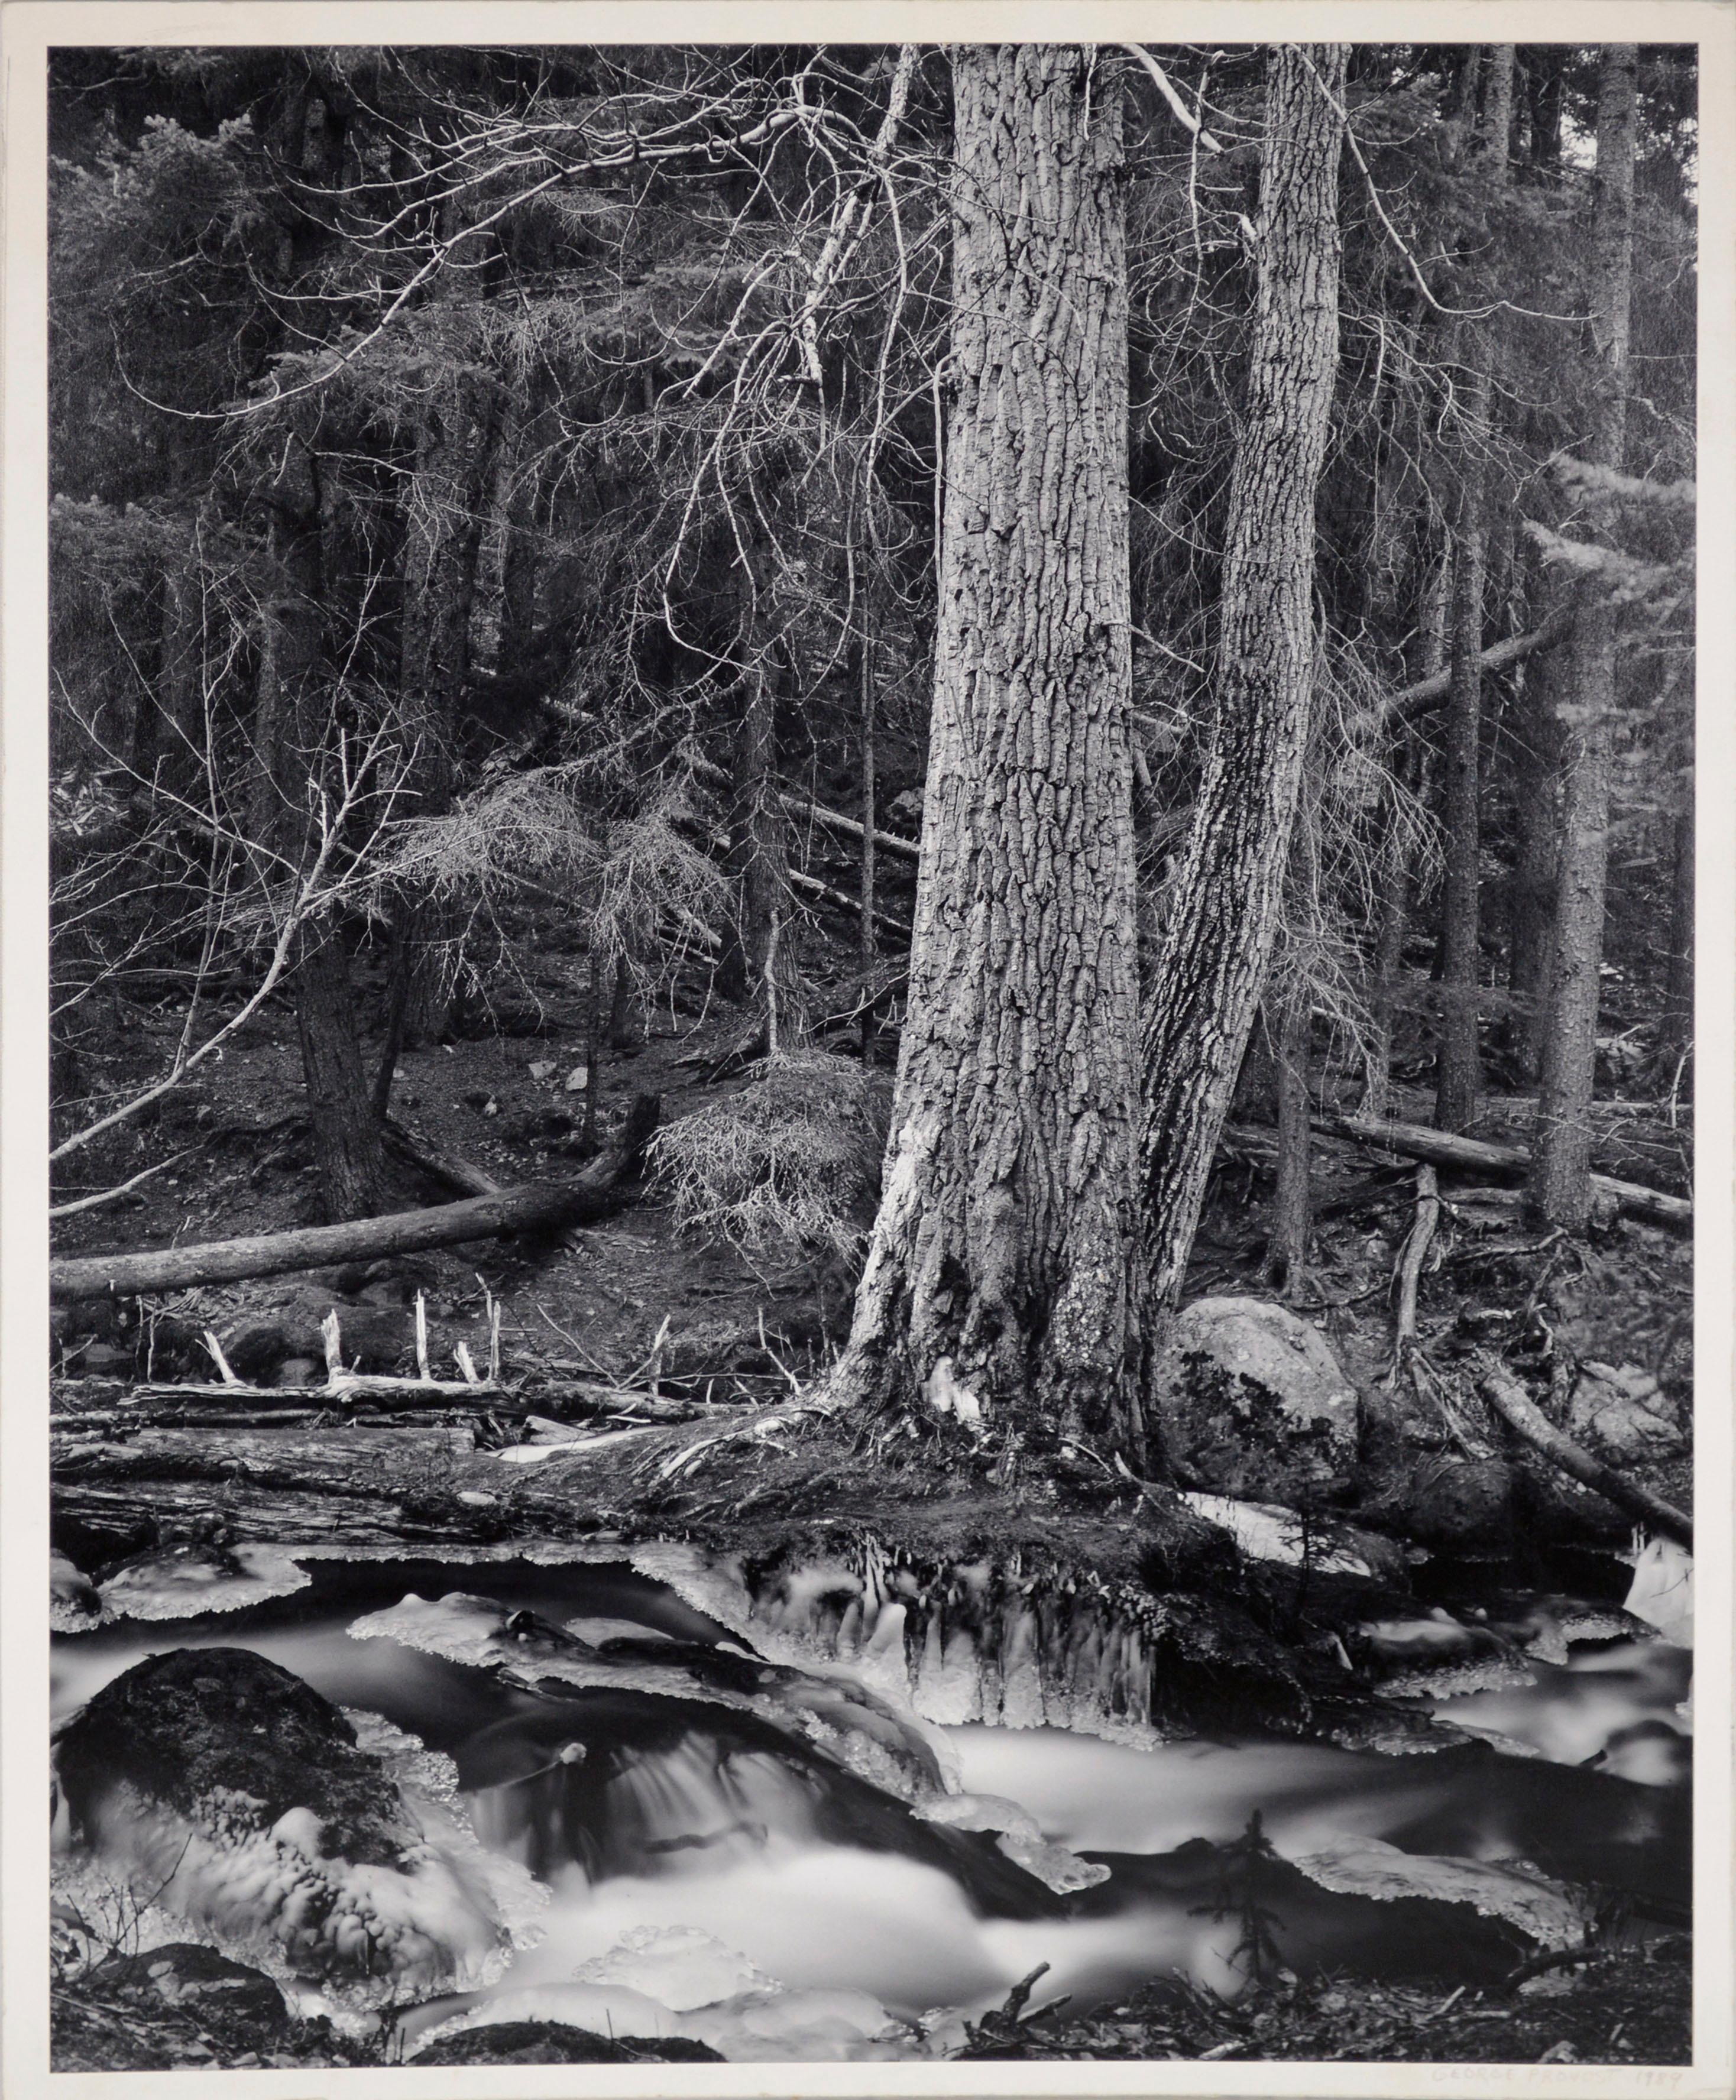 Alaska Forest Stream - Black & White Landscape Photograph